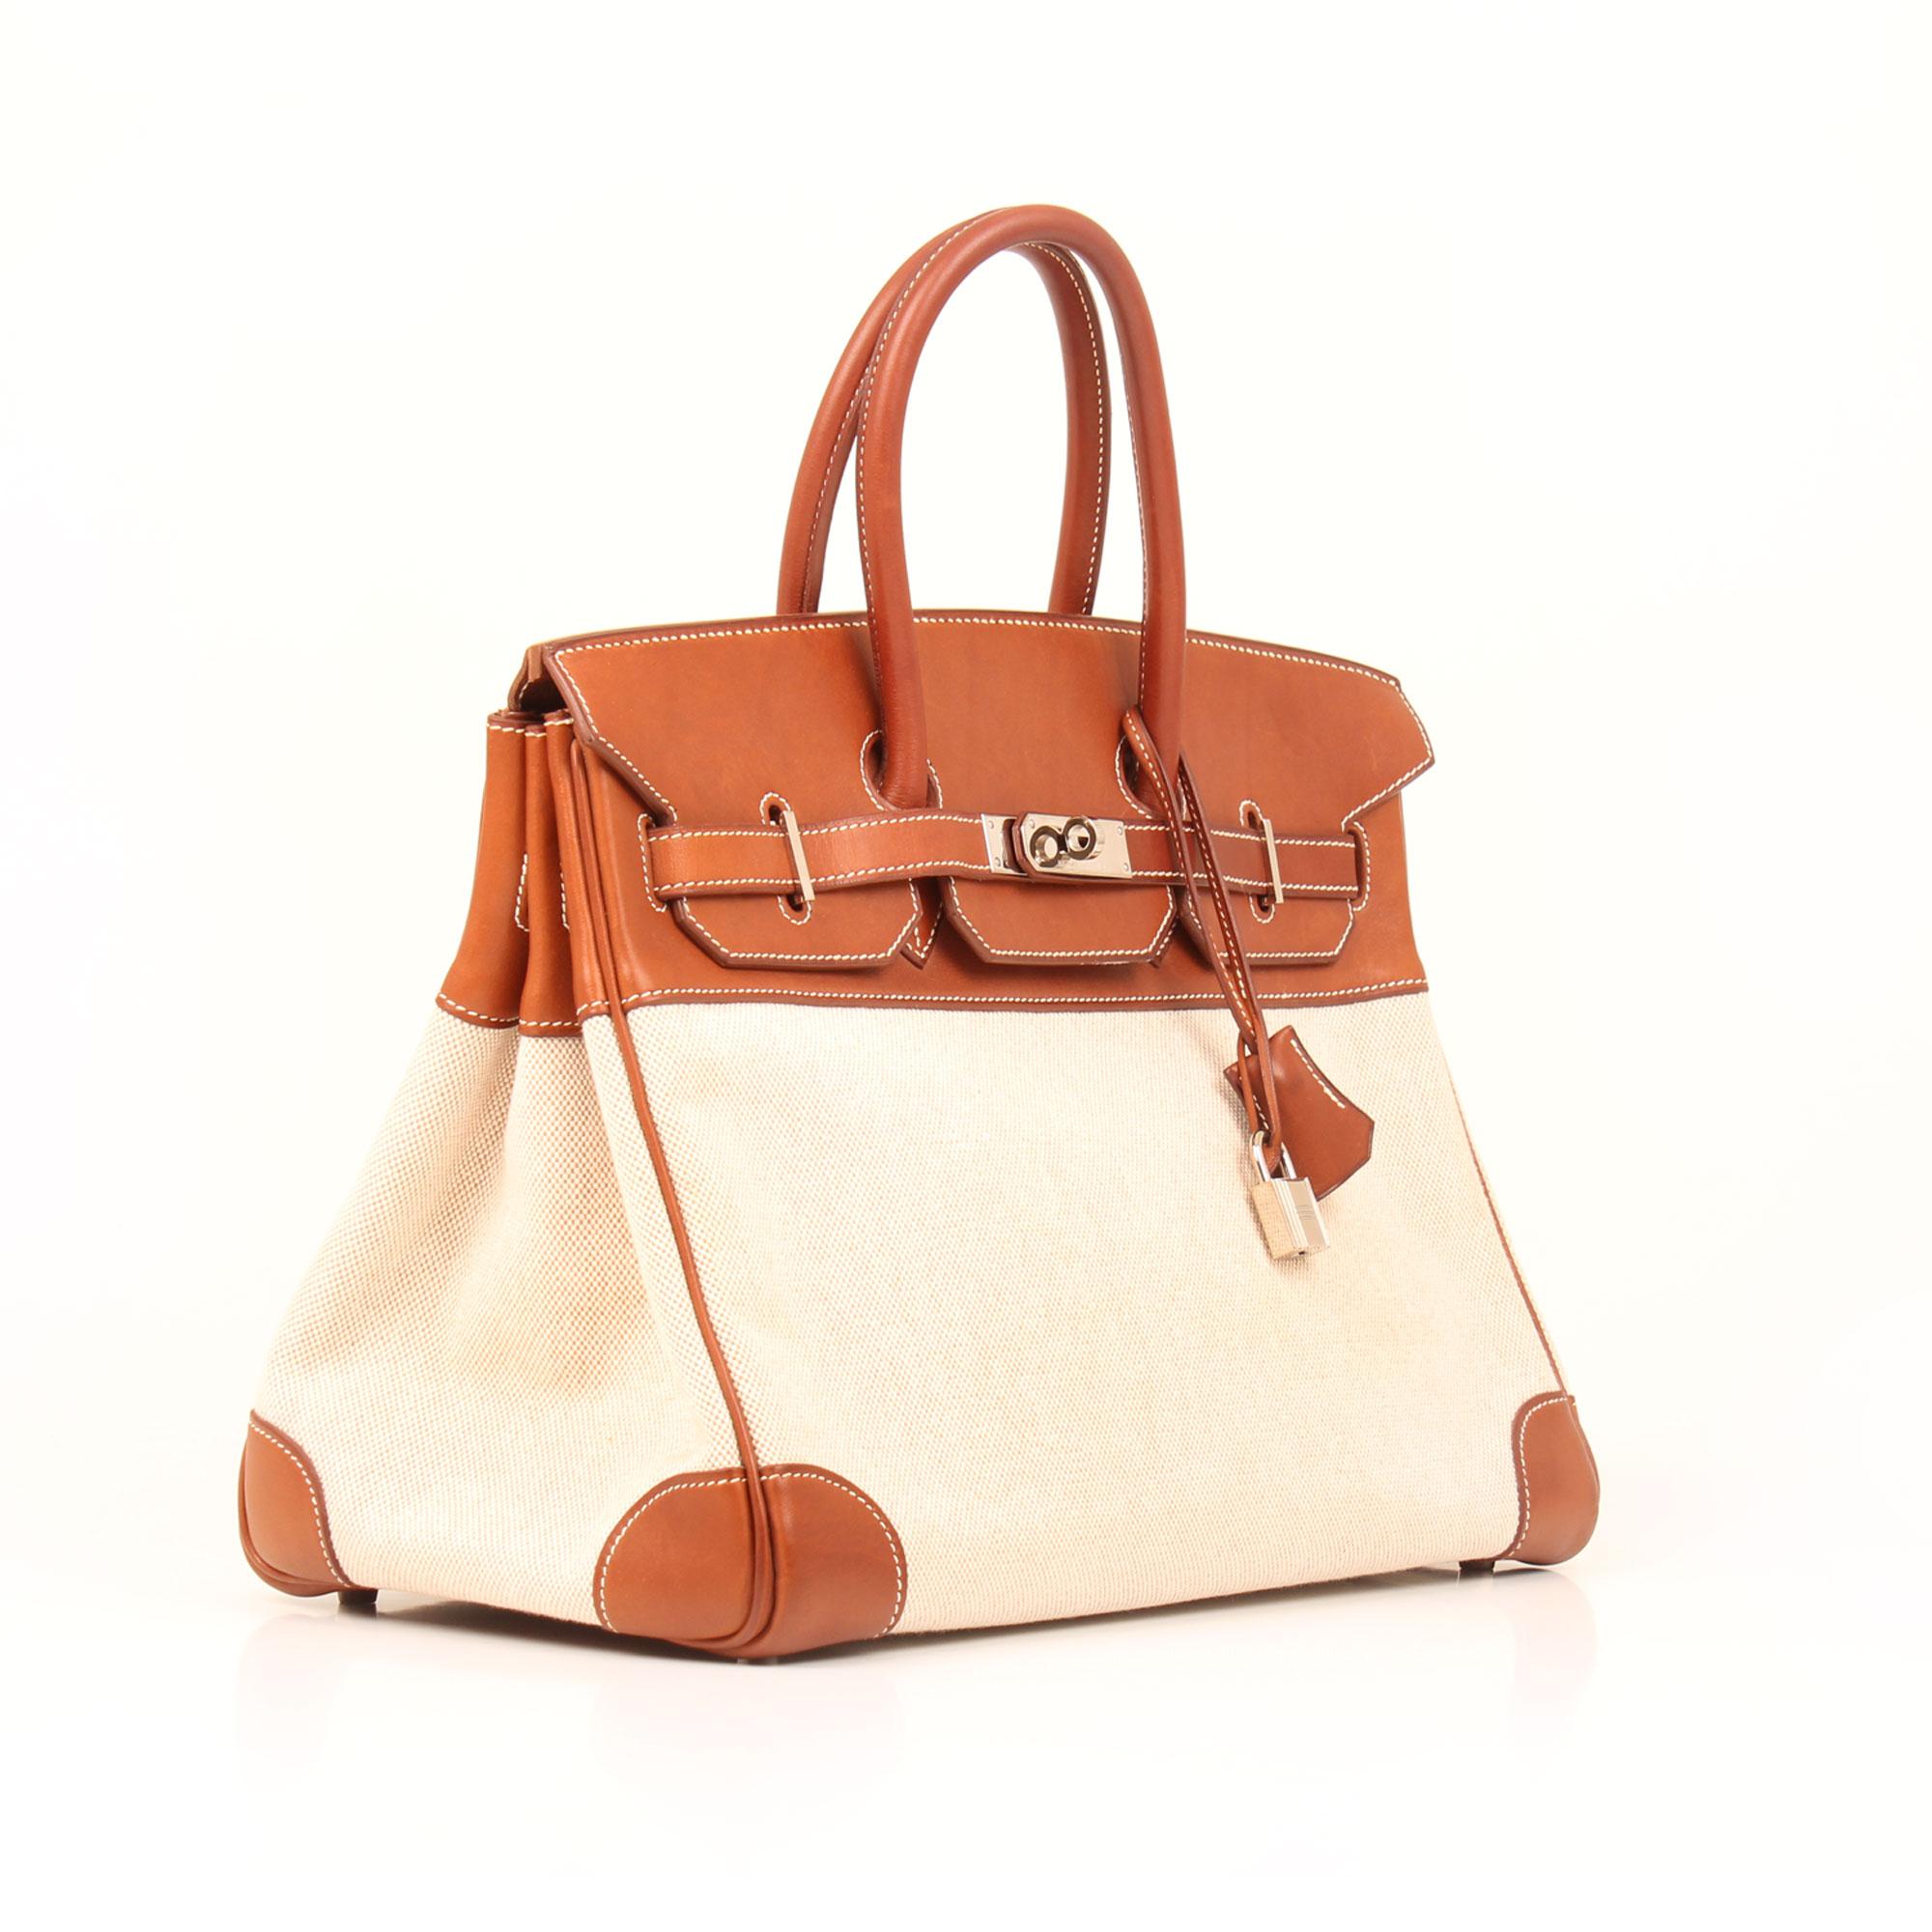 Hermès Birkin 35 Bag Barenia and Toile H canvas  a0223bfcce7eb